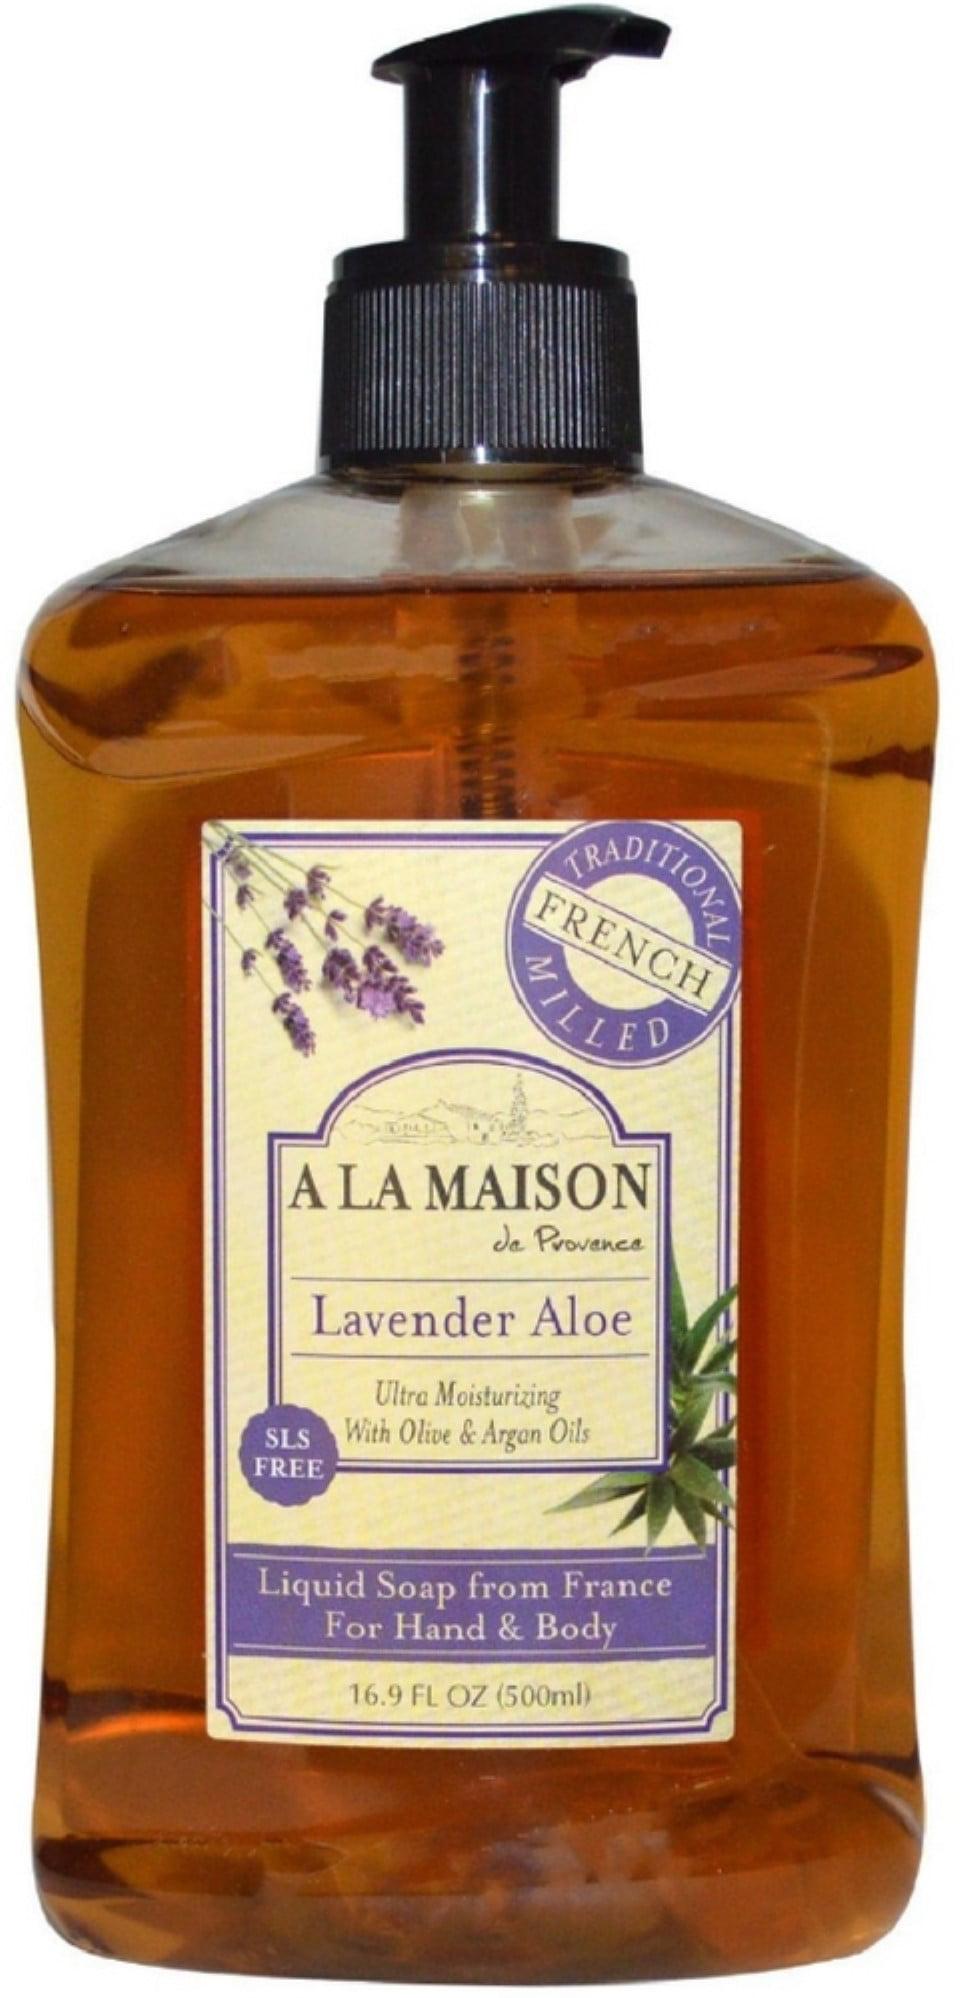 2 Pack - A LA MAISON Provence Liquid Soap, Lavender Aloe 16 9 oz